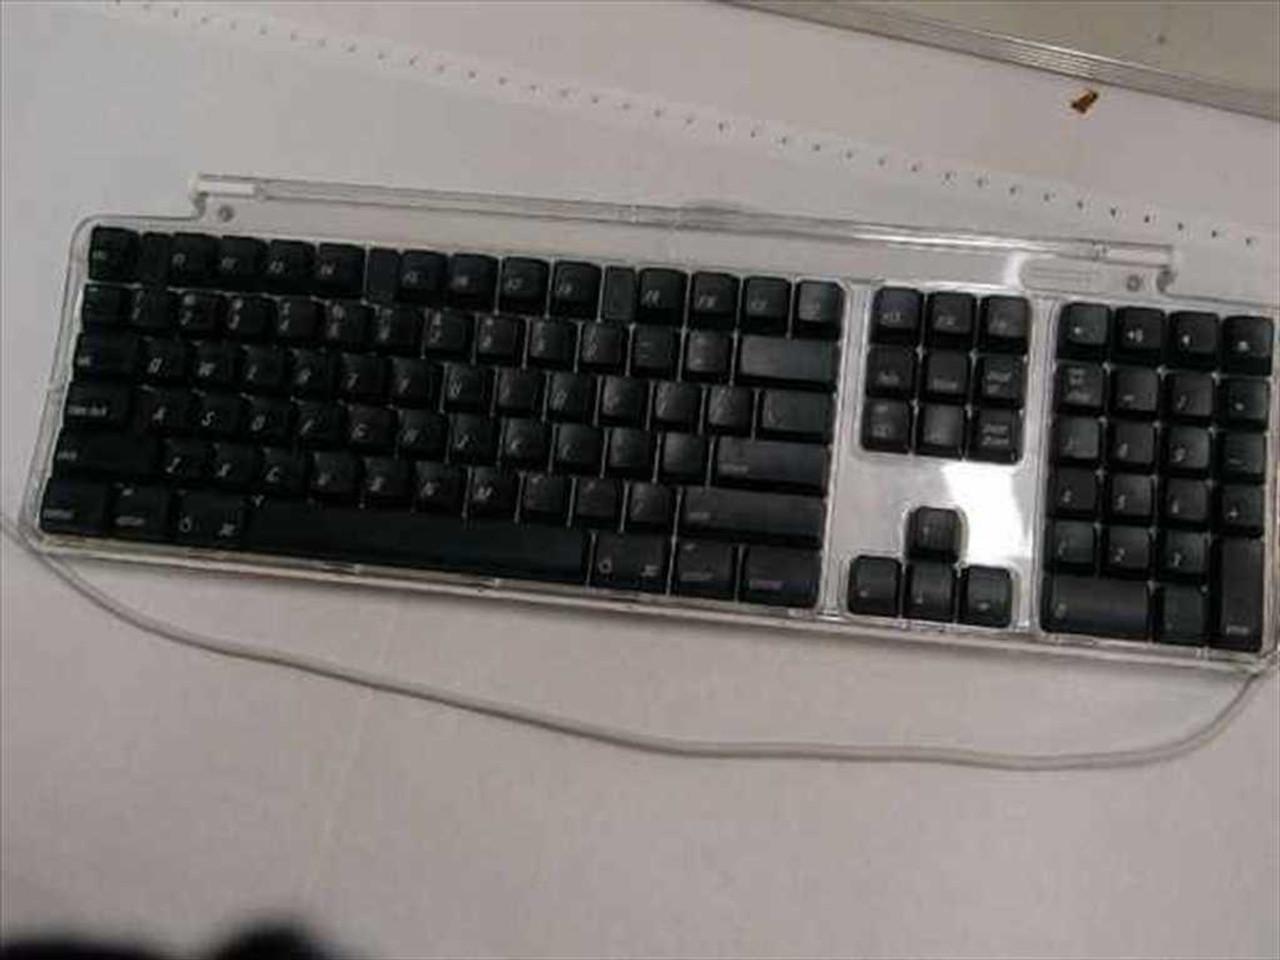 how to clean keyboard keys on macbook pro